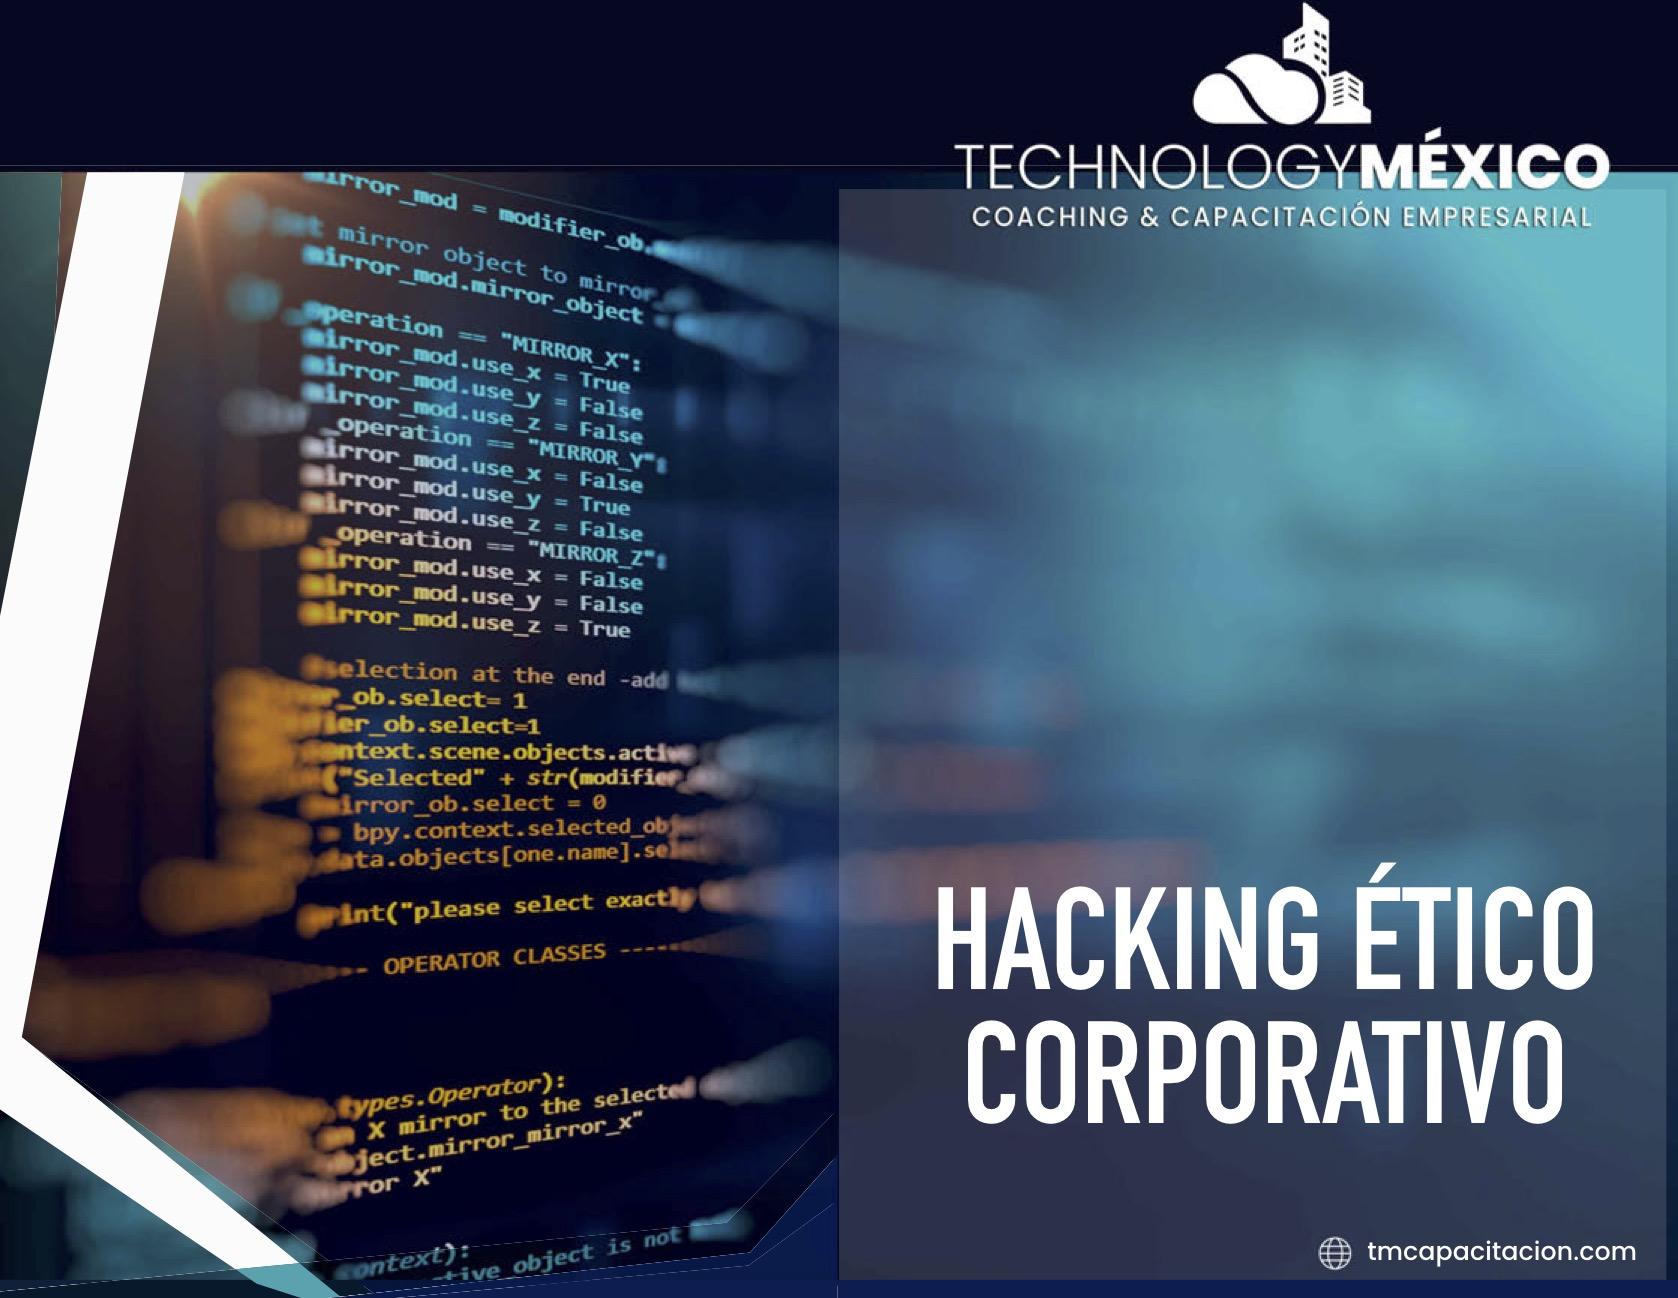 Hacking Ético Corporativo